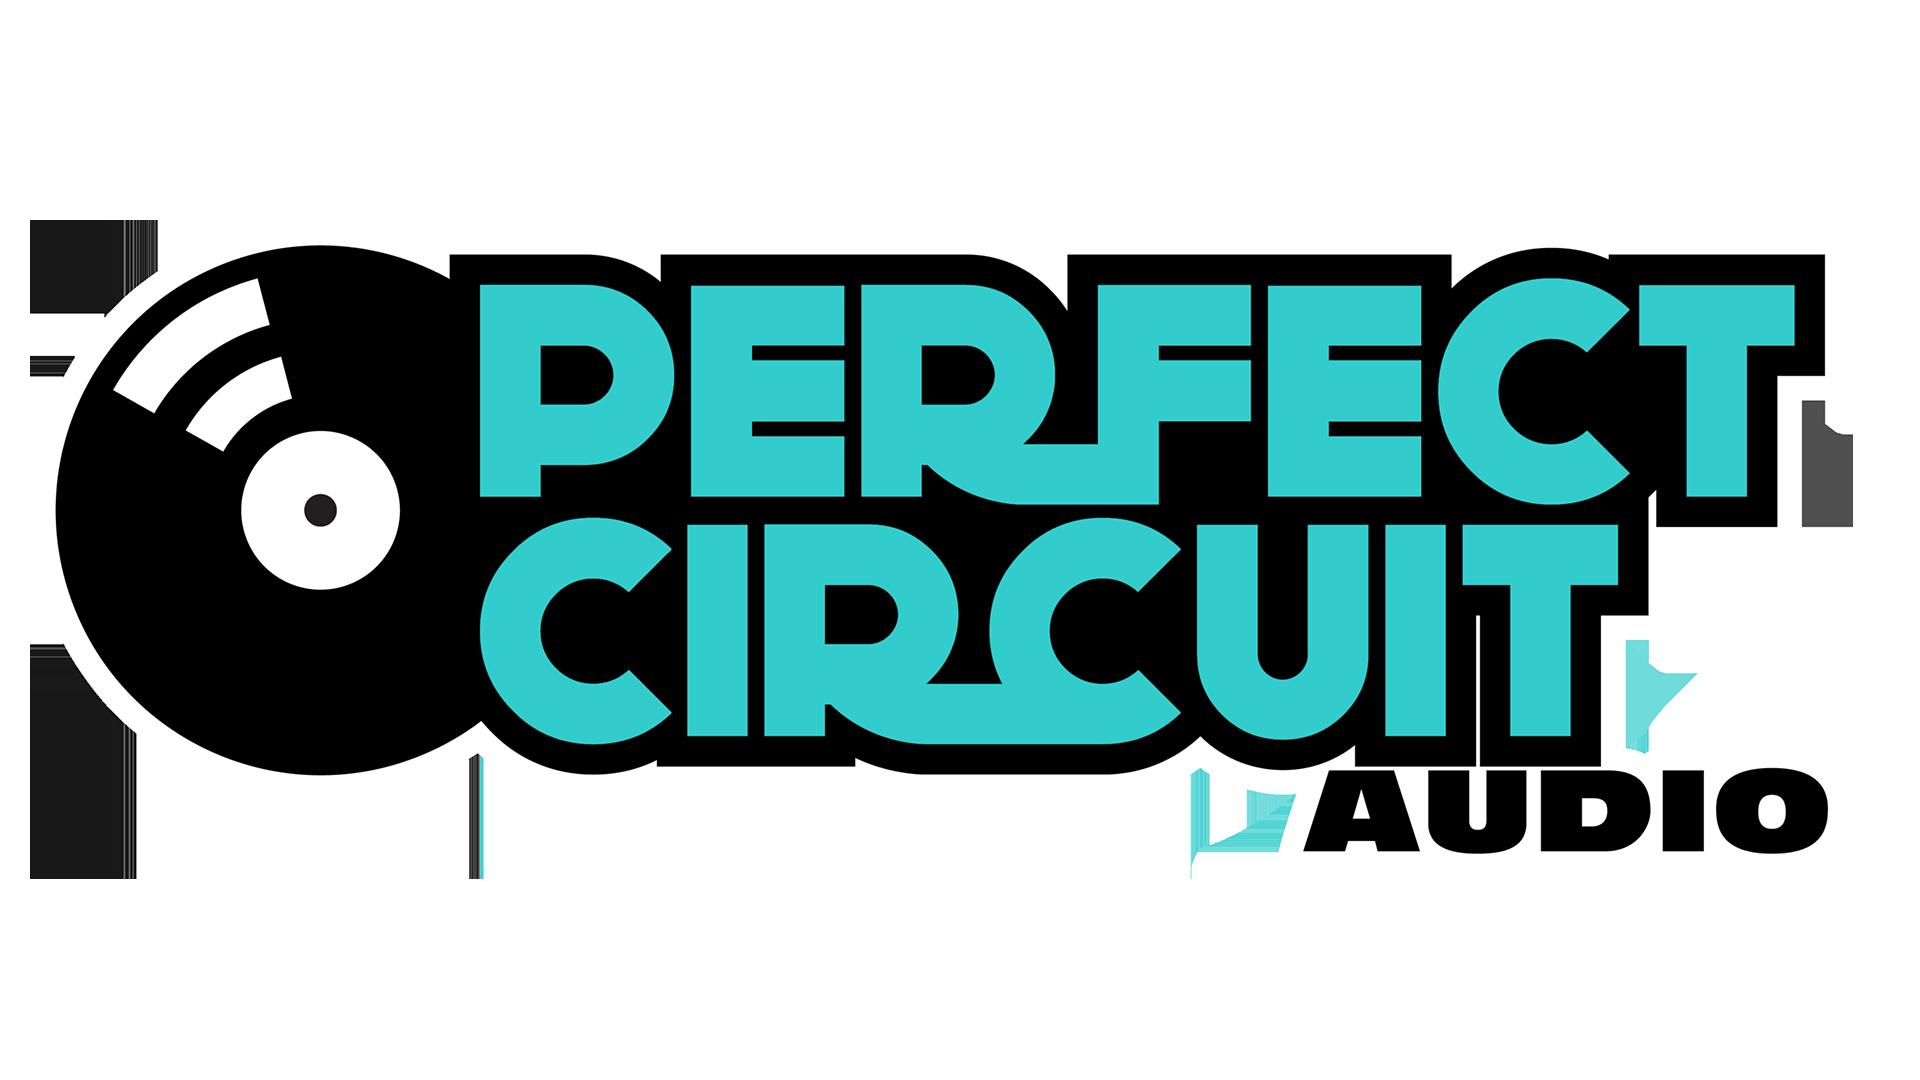 Perfect Circuit Audio - Burbank, CA